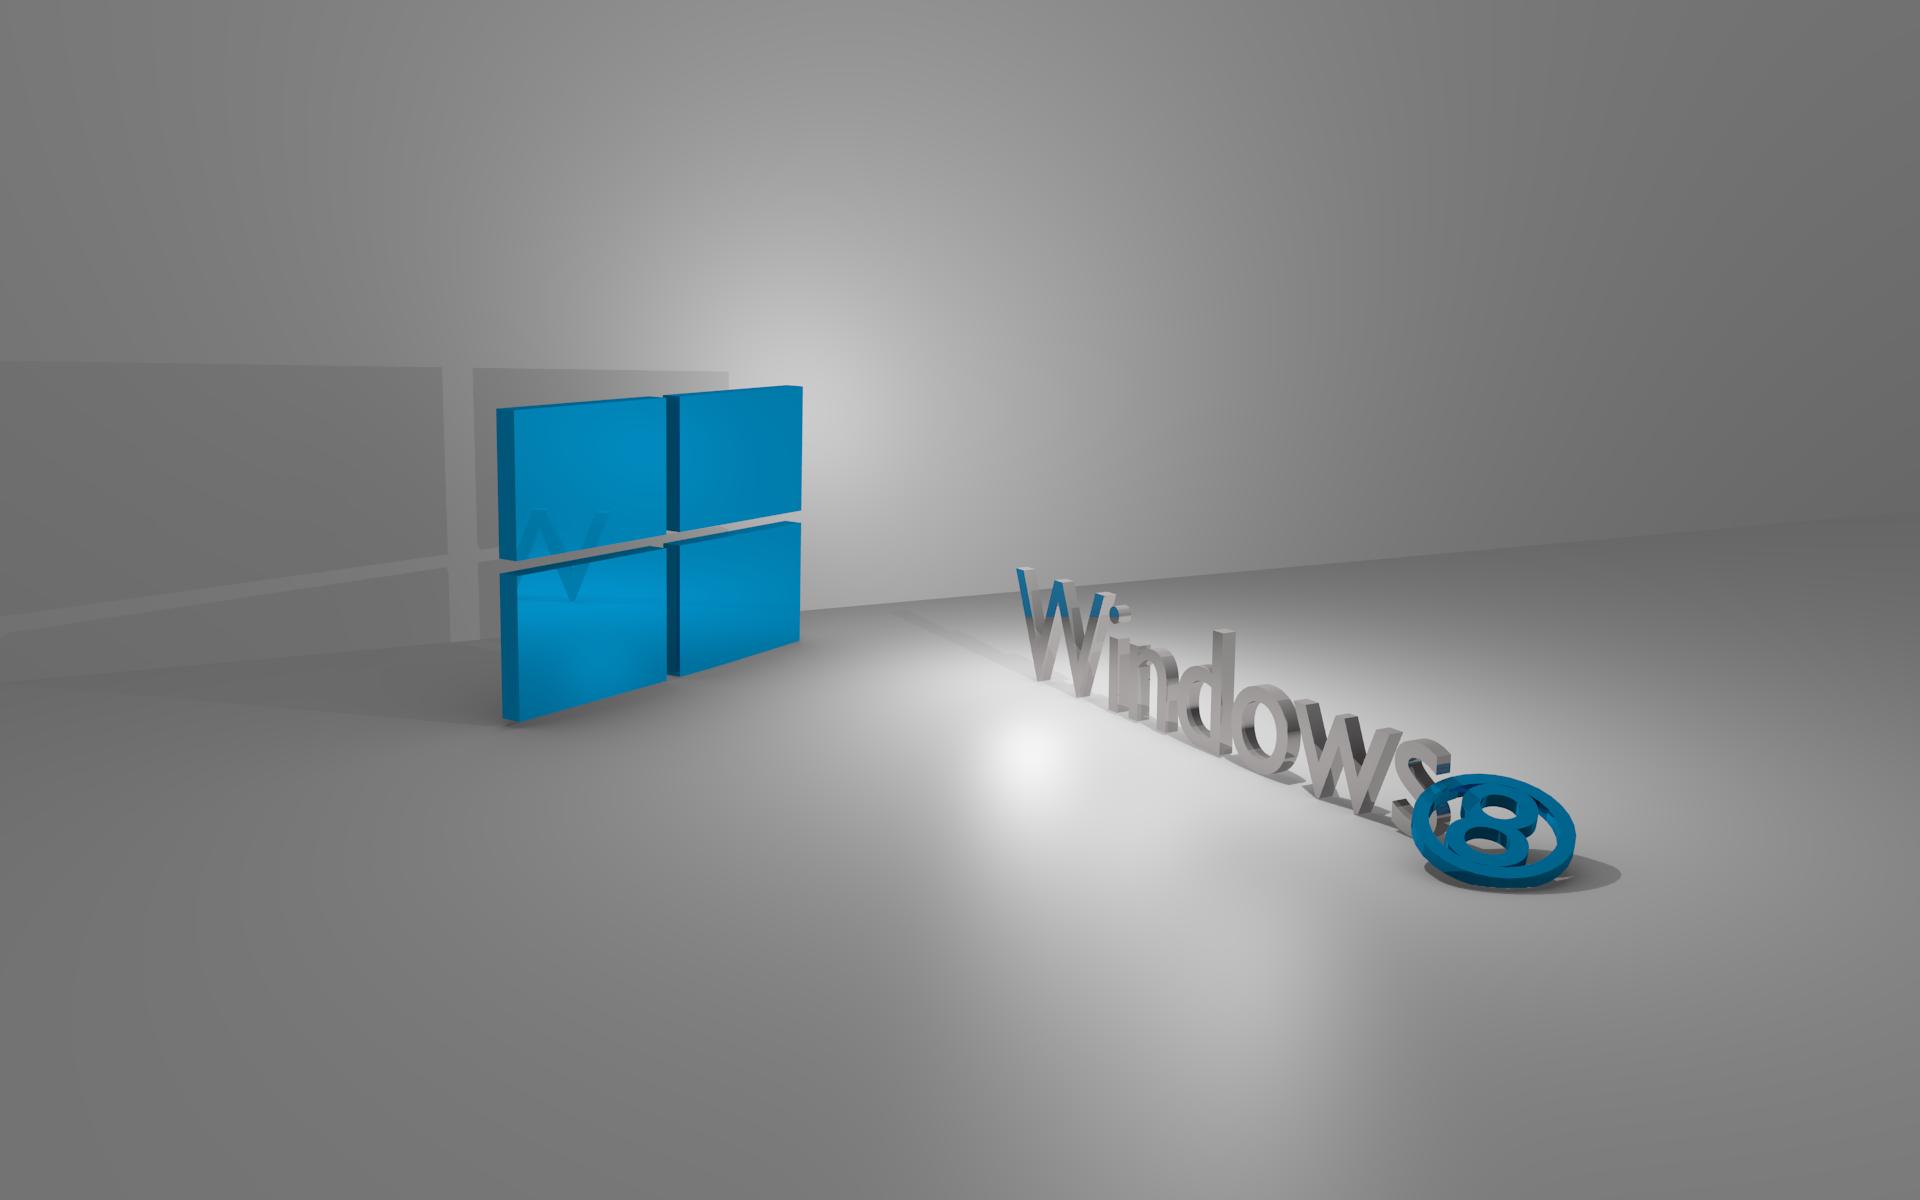 38 Windows 10 Wallpapers Hd 3d On Wallpapersafari